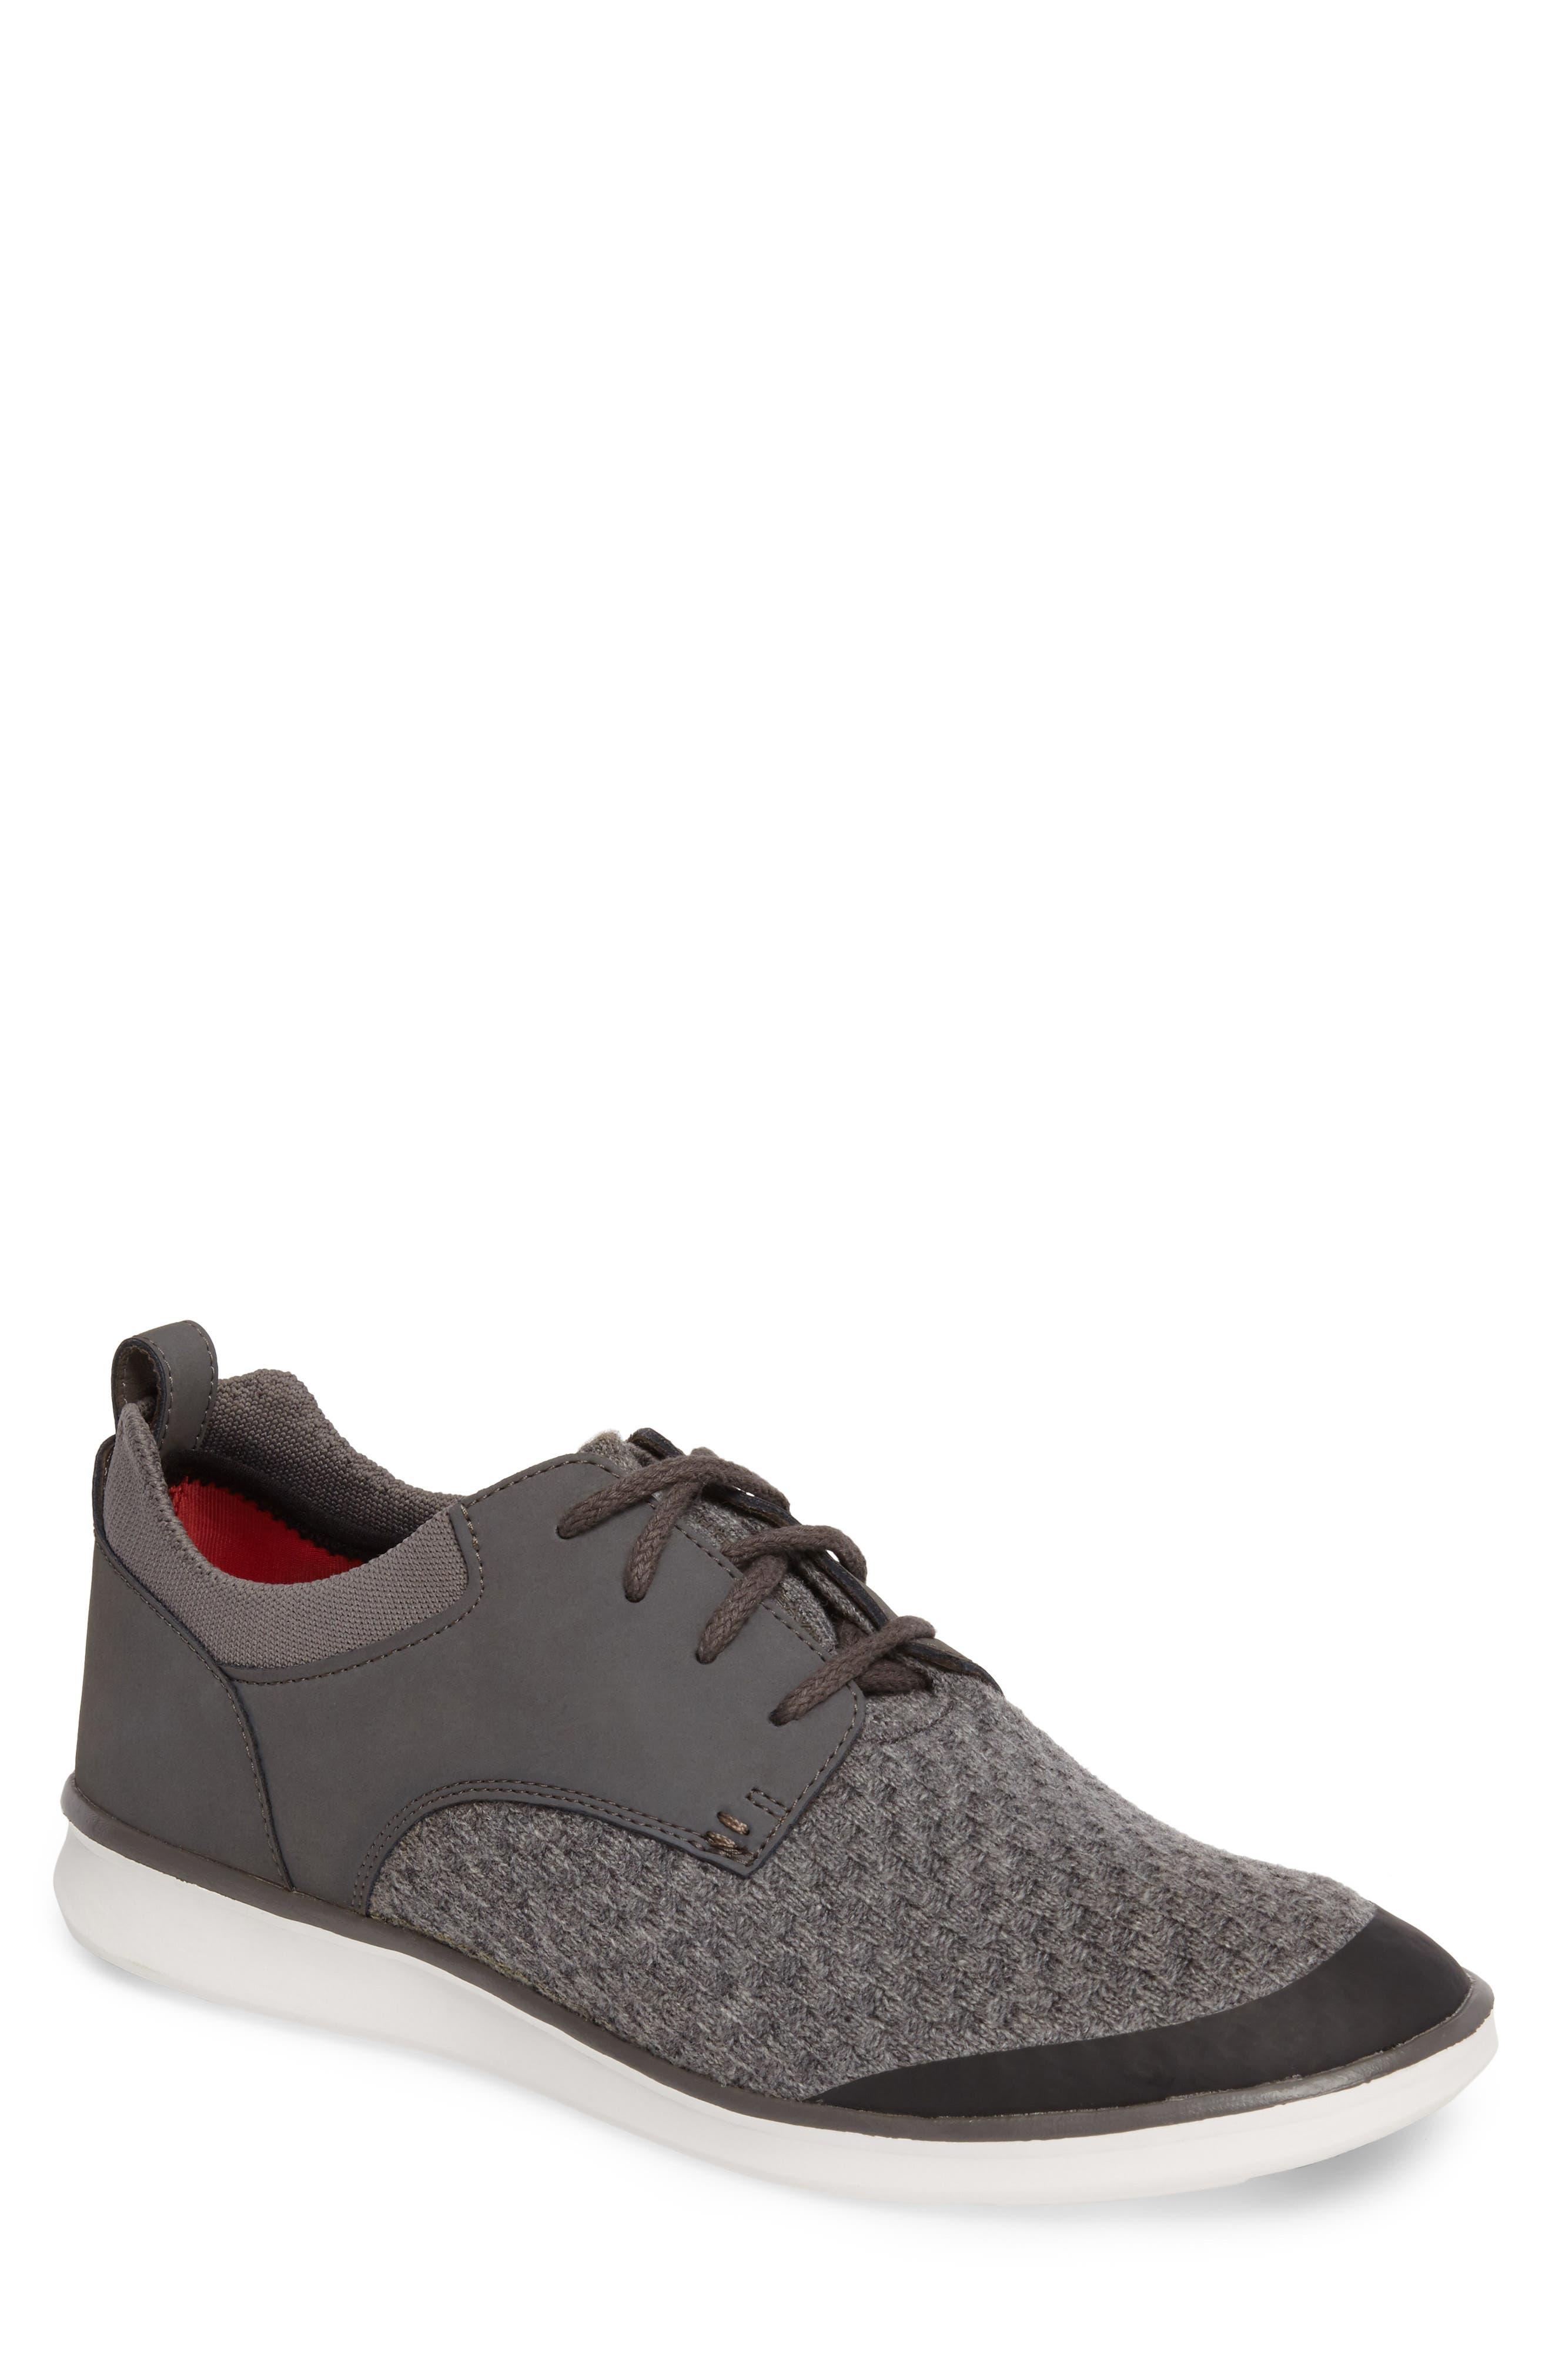 Hepner HyperWeave Sneaker,                         Main,                         color, Dark Charcoal